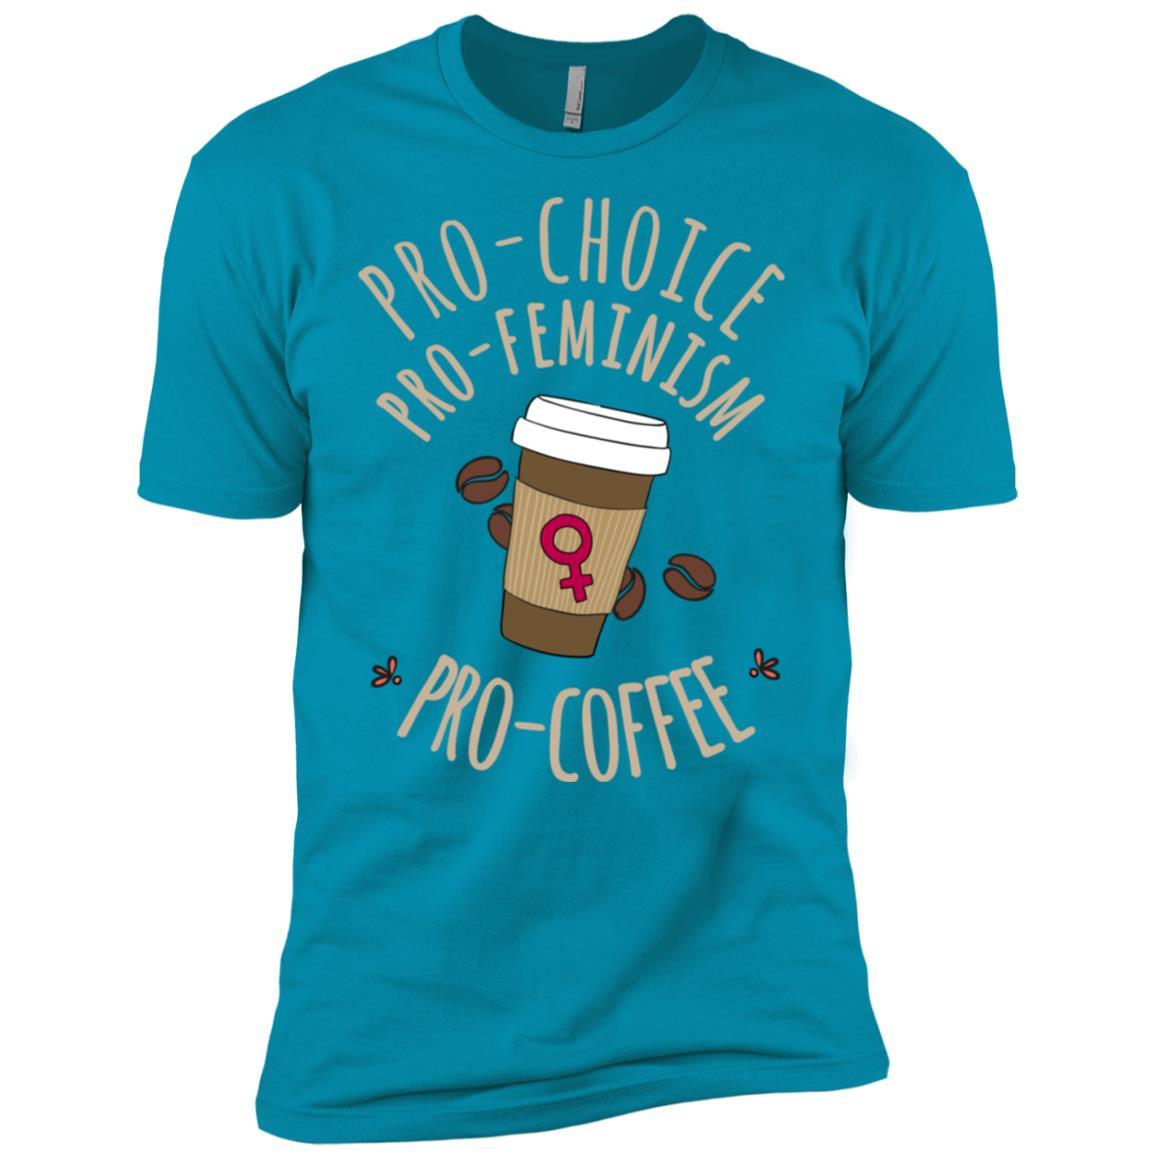 Pro Choice Pro Feminism Coffee Feminist Men Short Sleeve T-Shirt